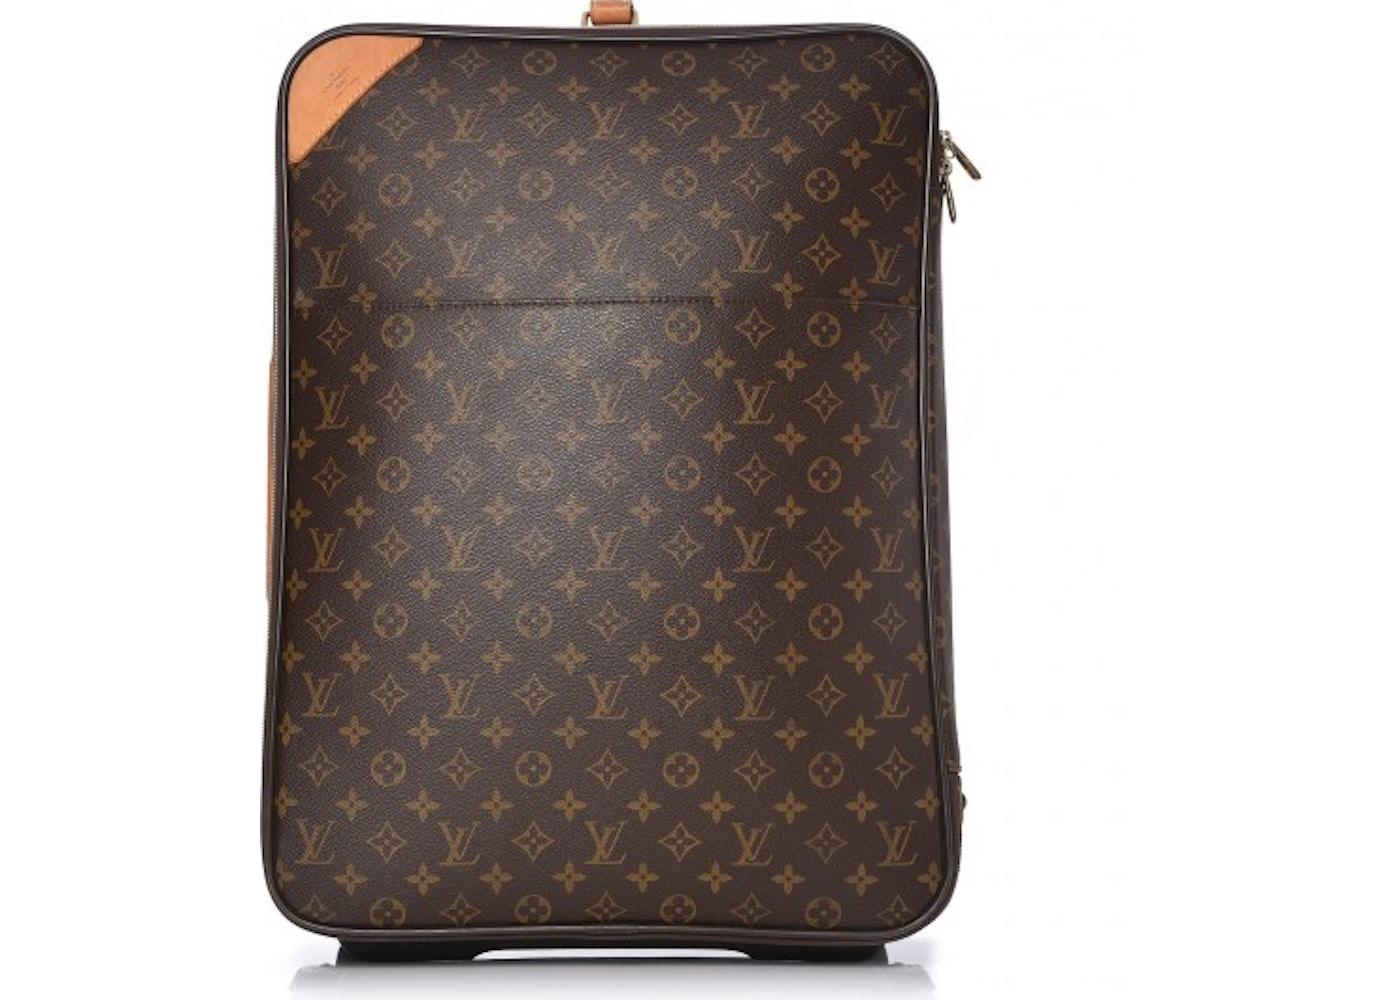 46e3578fa0 Louis Vuitton Suitcase Pegase Business NM Monogram 55 Brown. Monogram 55  Brown